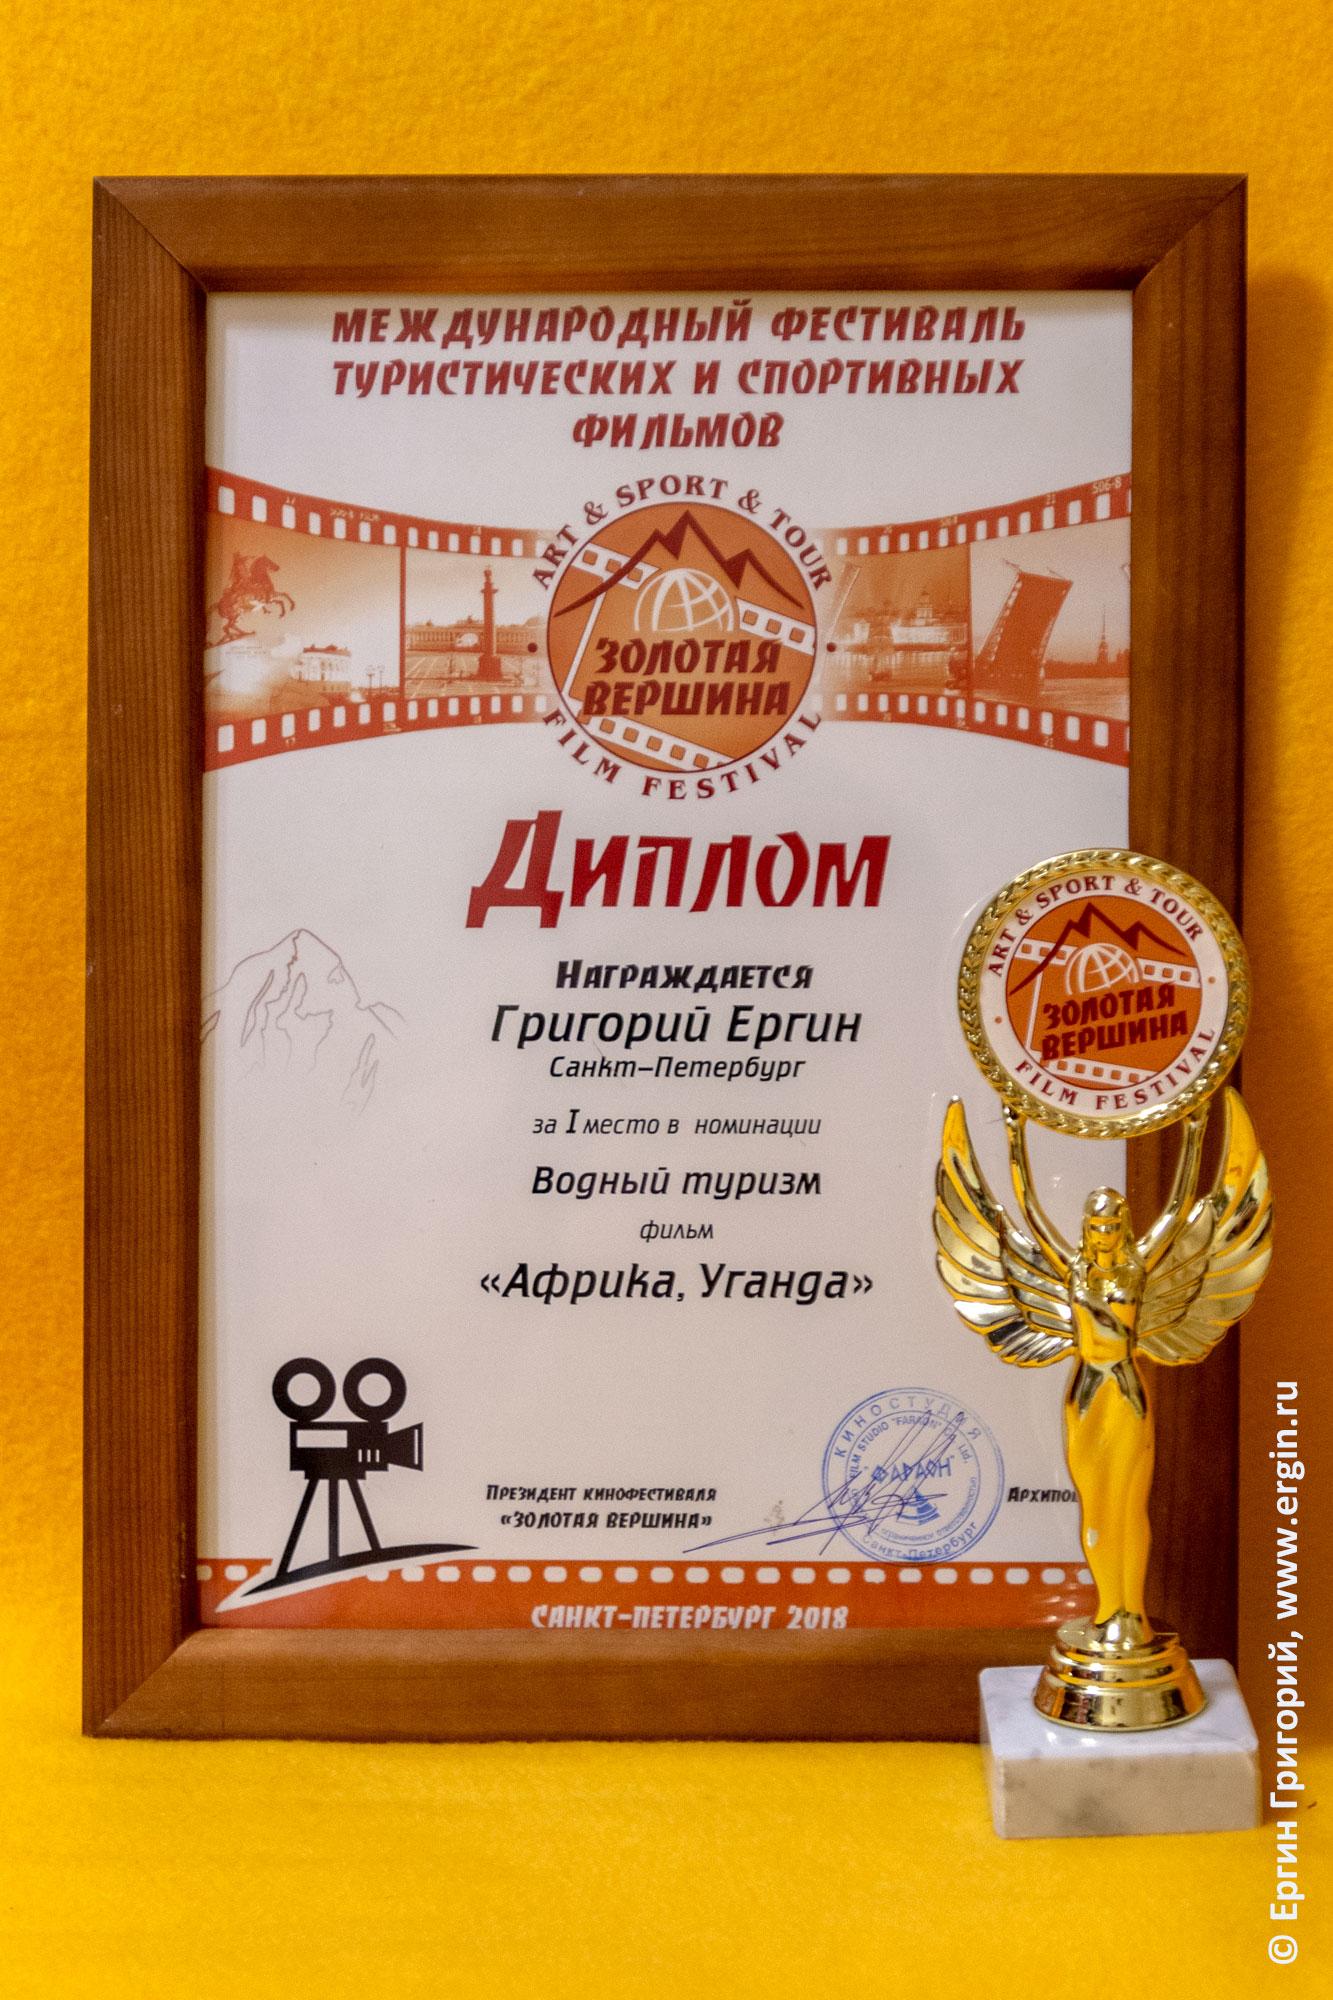 Диплом награда за фильм об Уганде и каякинге на кинофестивале Золотая вершина